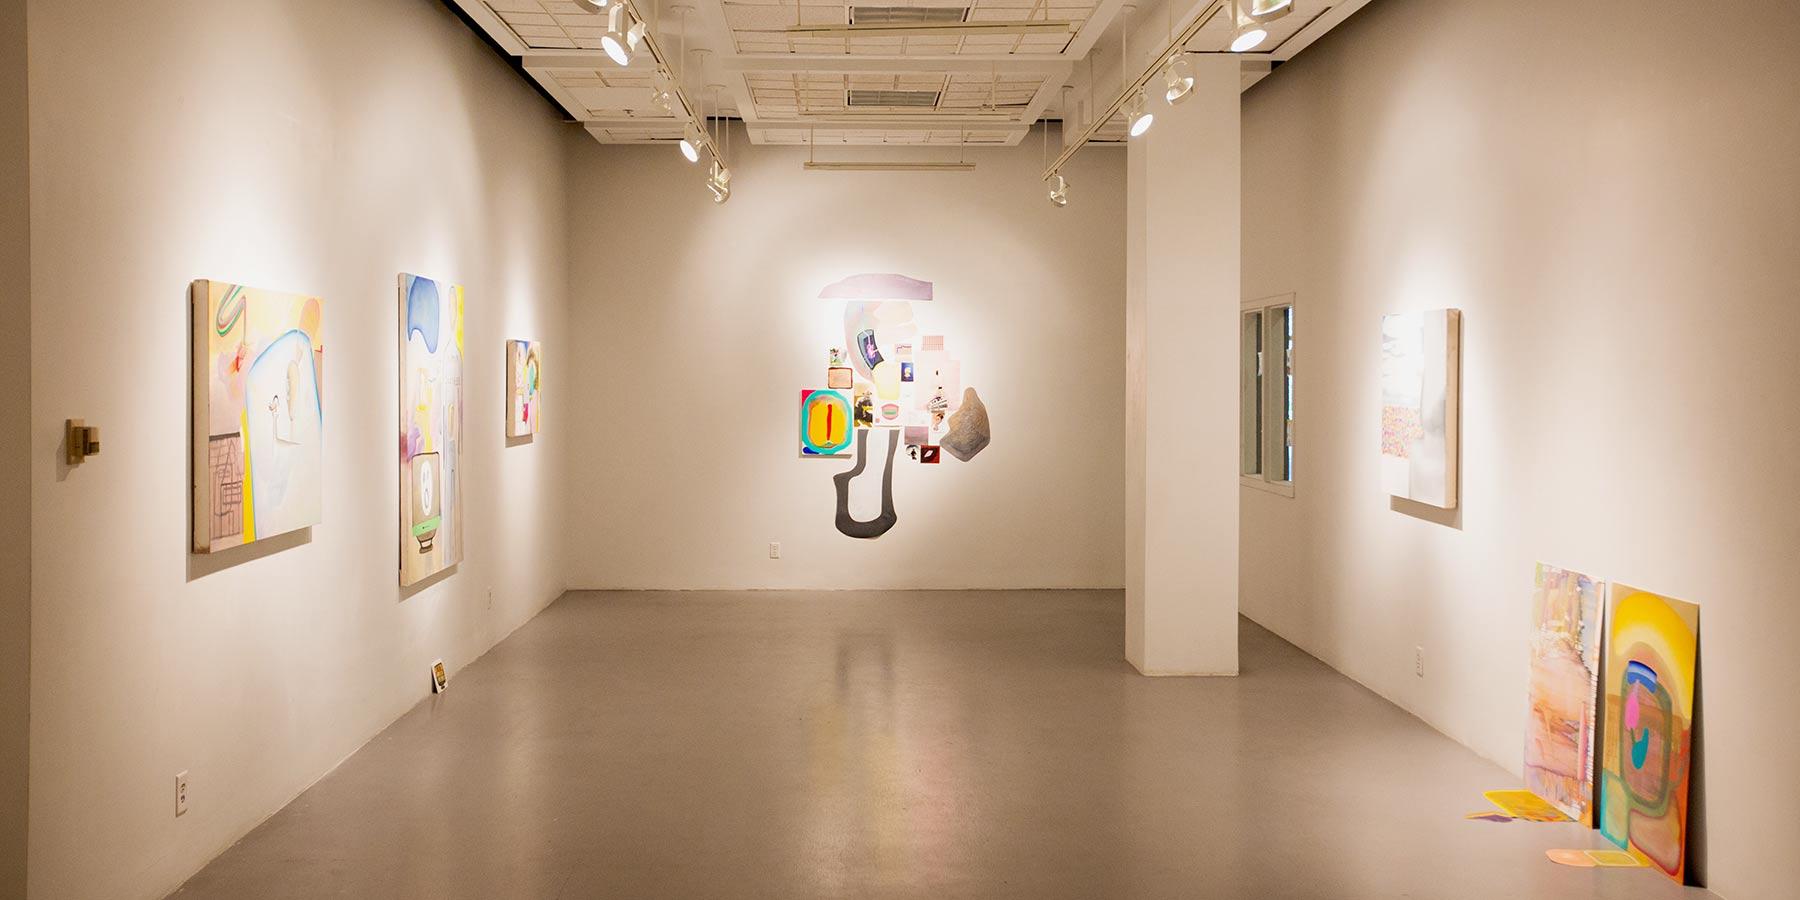 LaVerne Krause Gallery with paintings on display